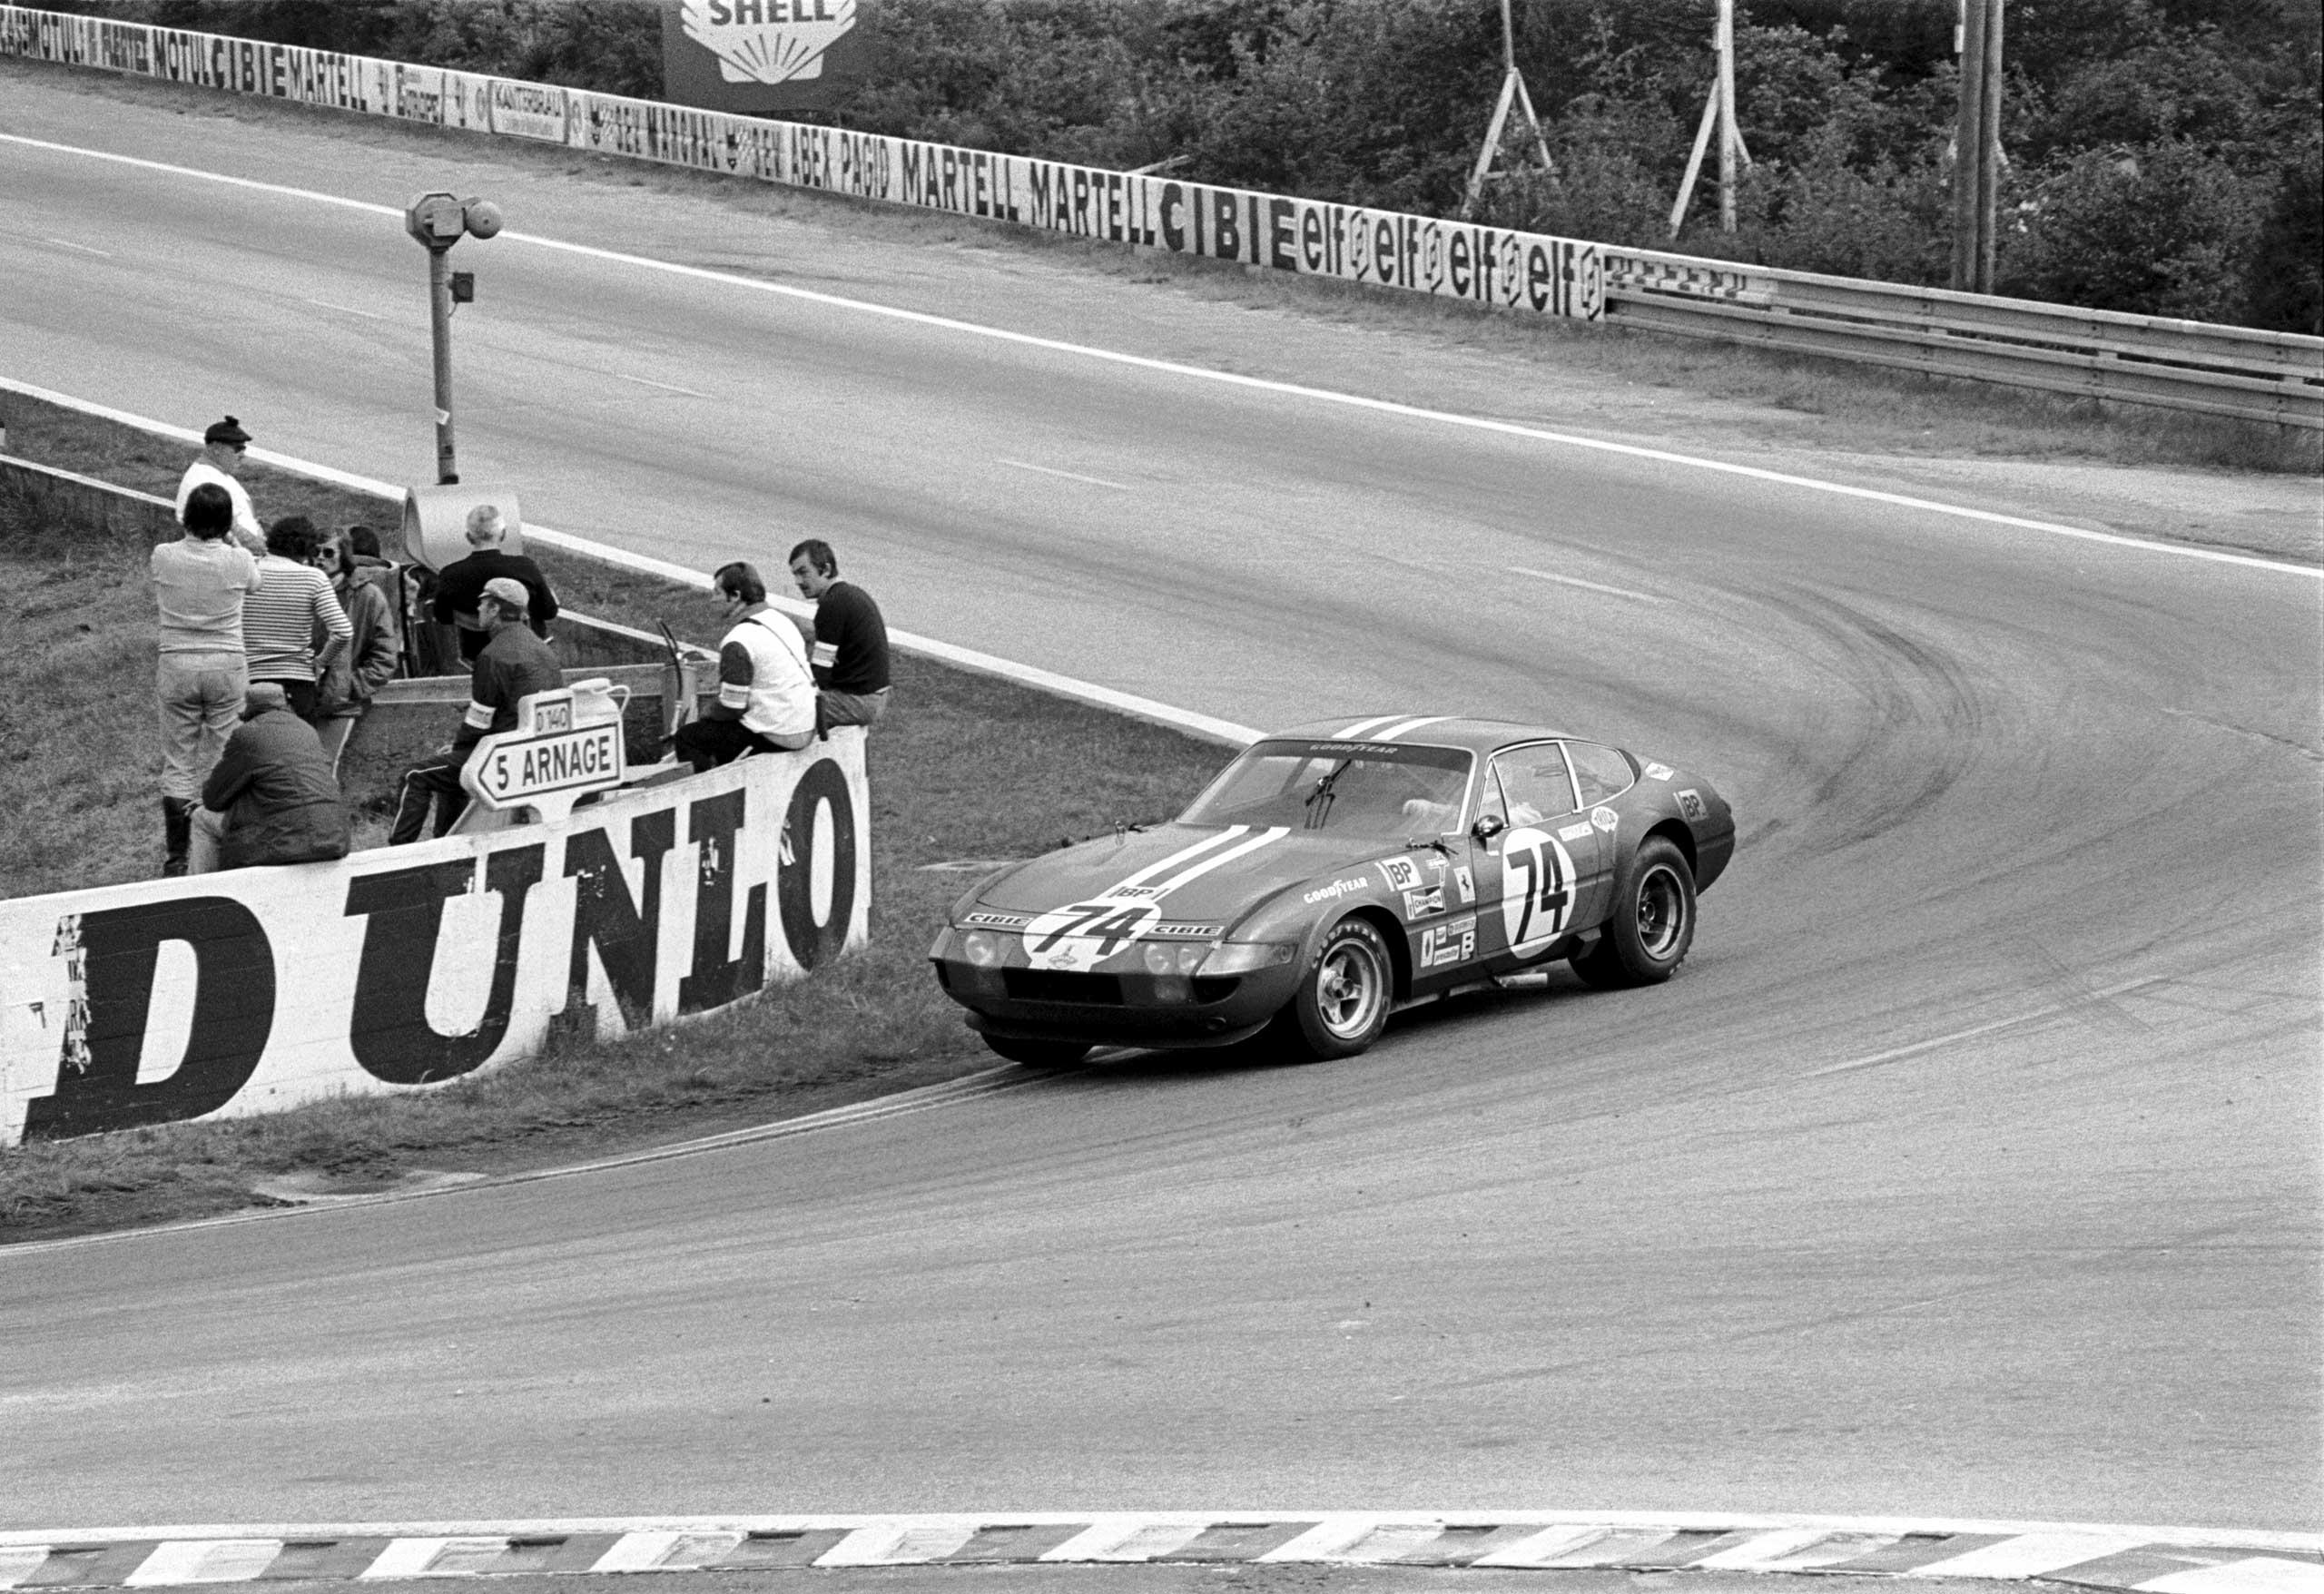 1968: The 365 GTB  Daytona  was first introduced at the Paris Auto Salon.